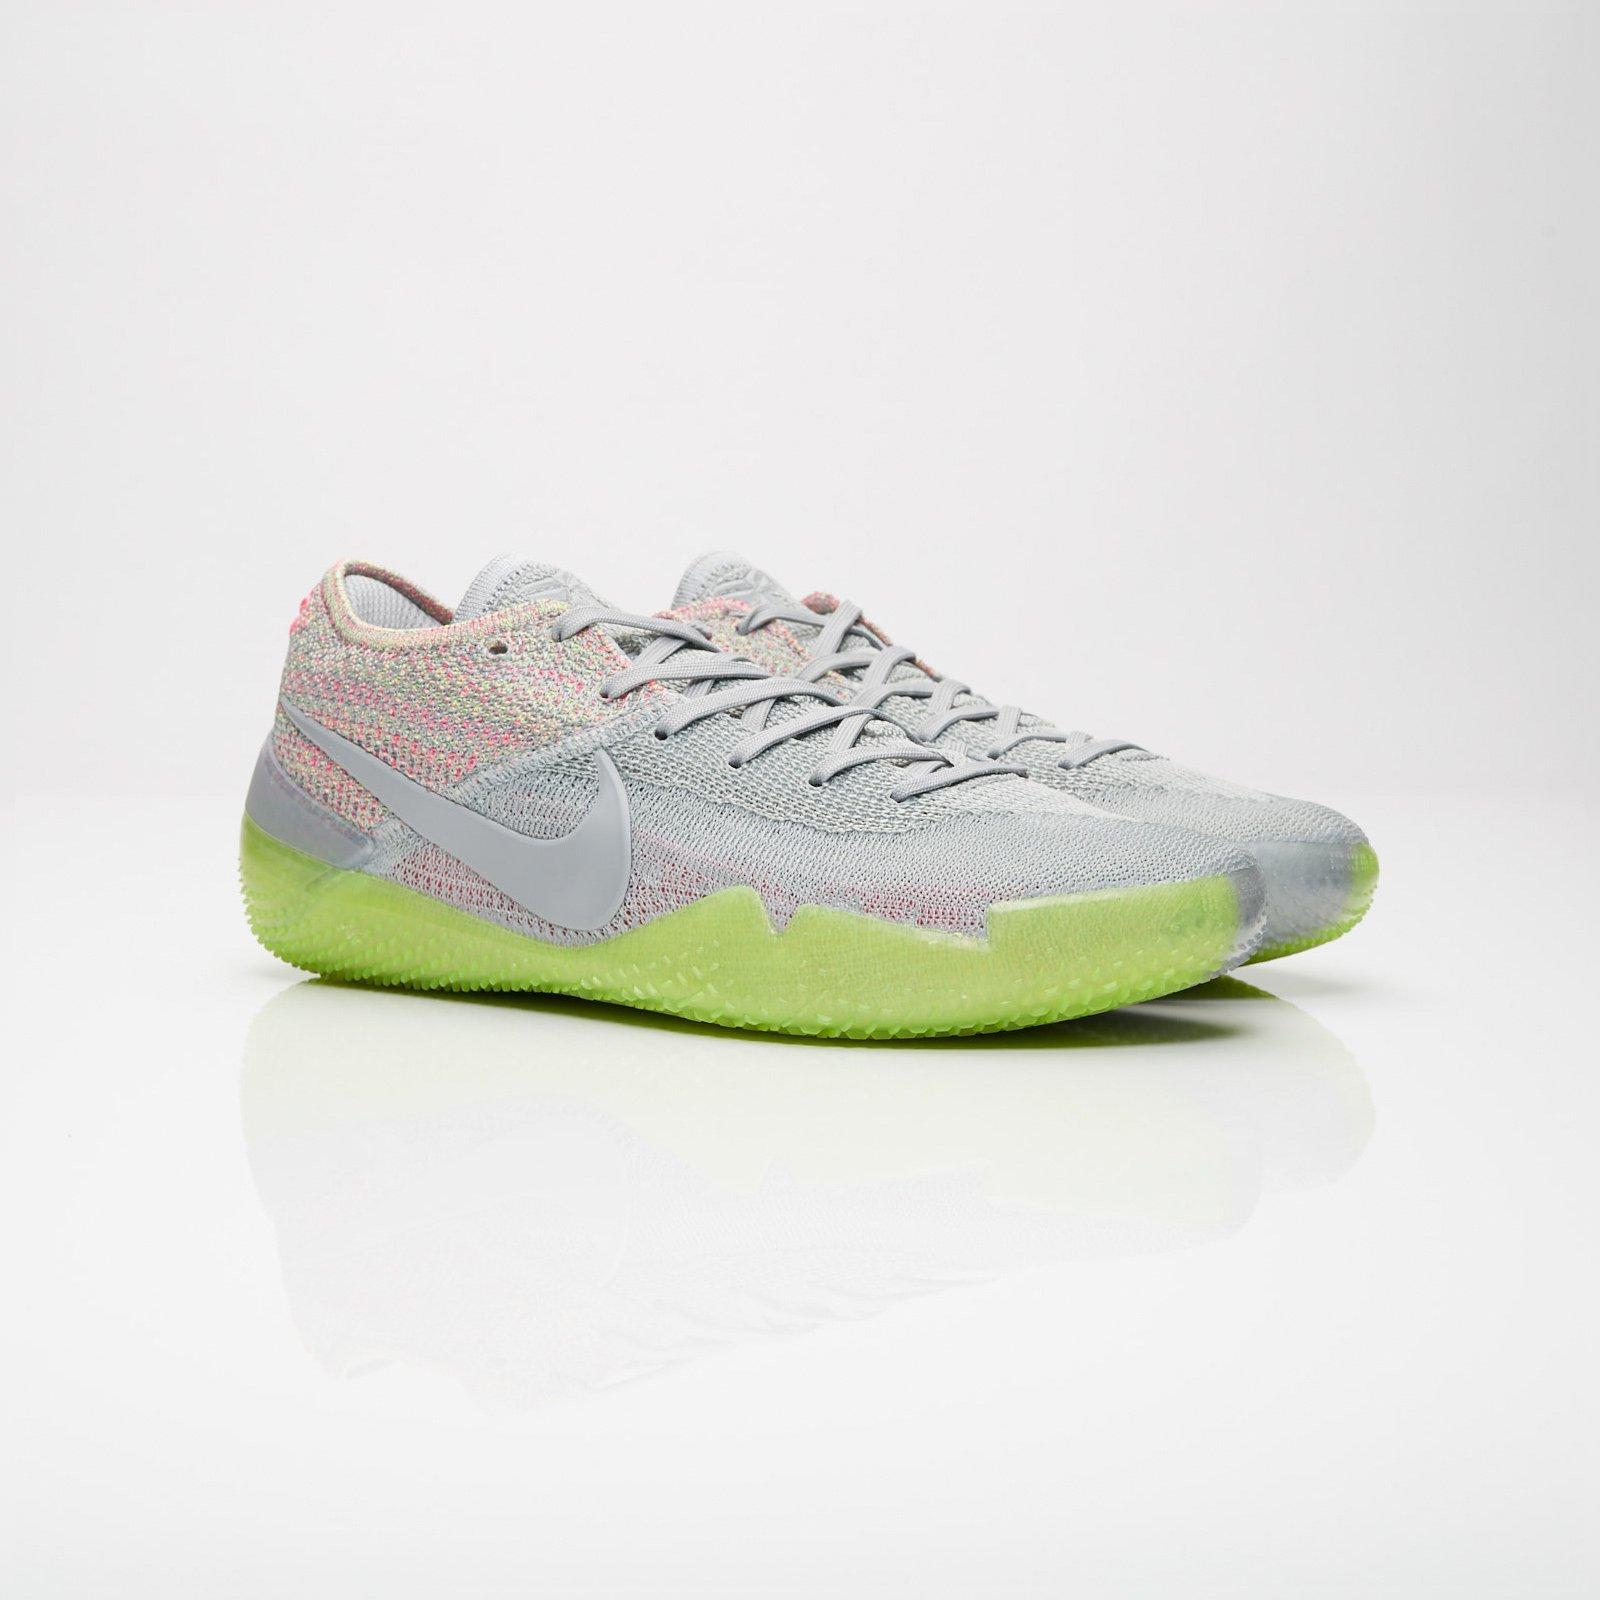 official photos acfac e9c3c Nike Basketball Kobe AD Nxt 360